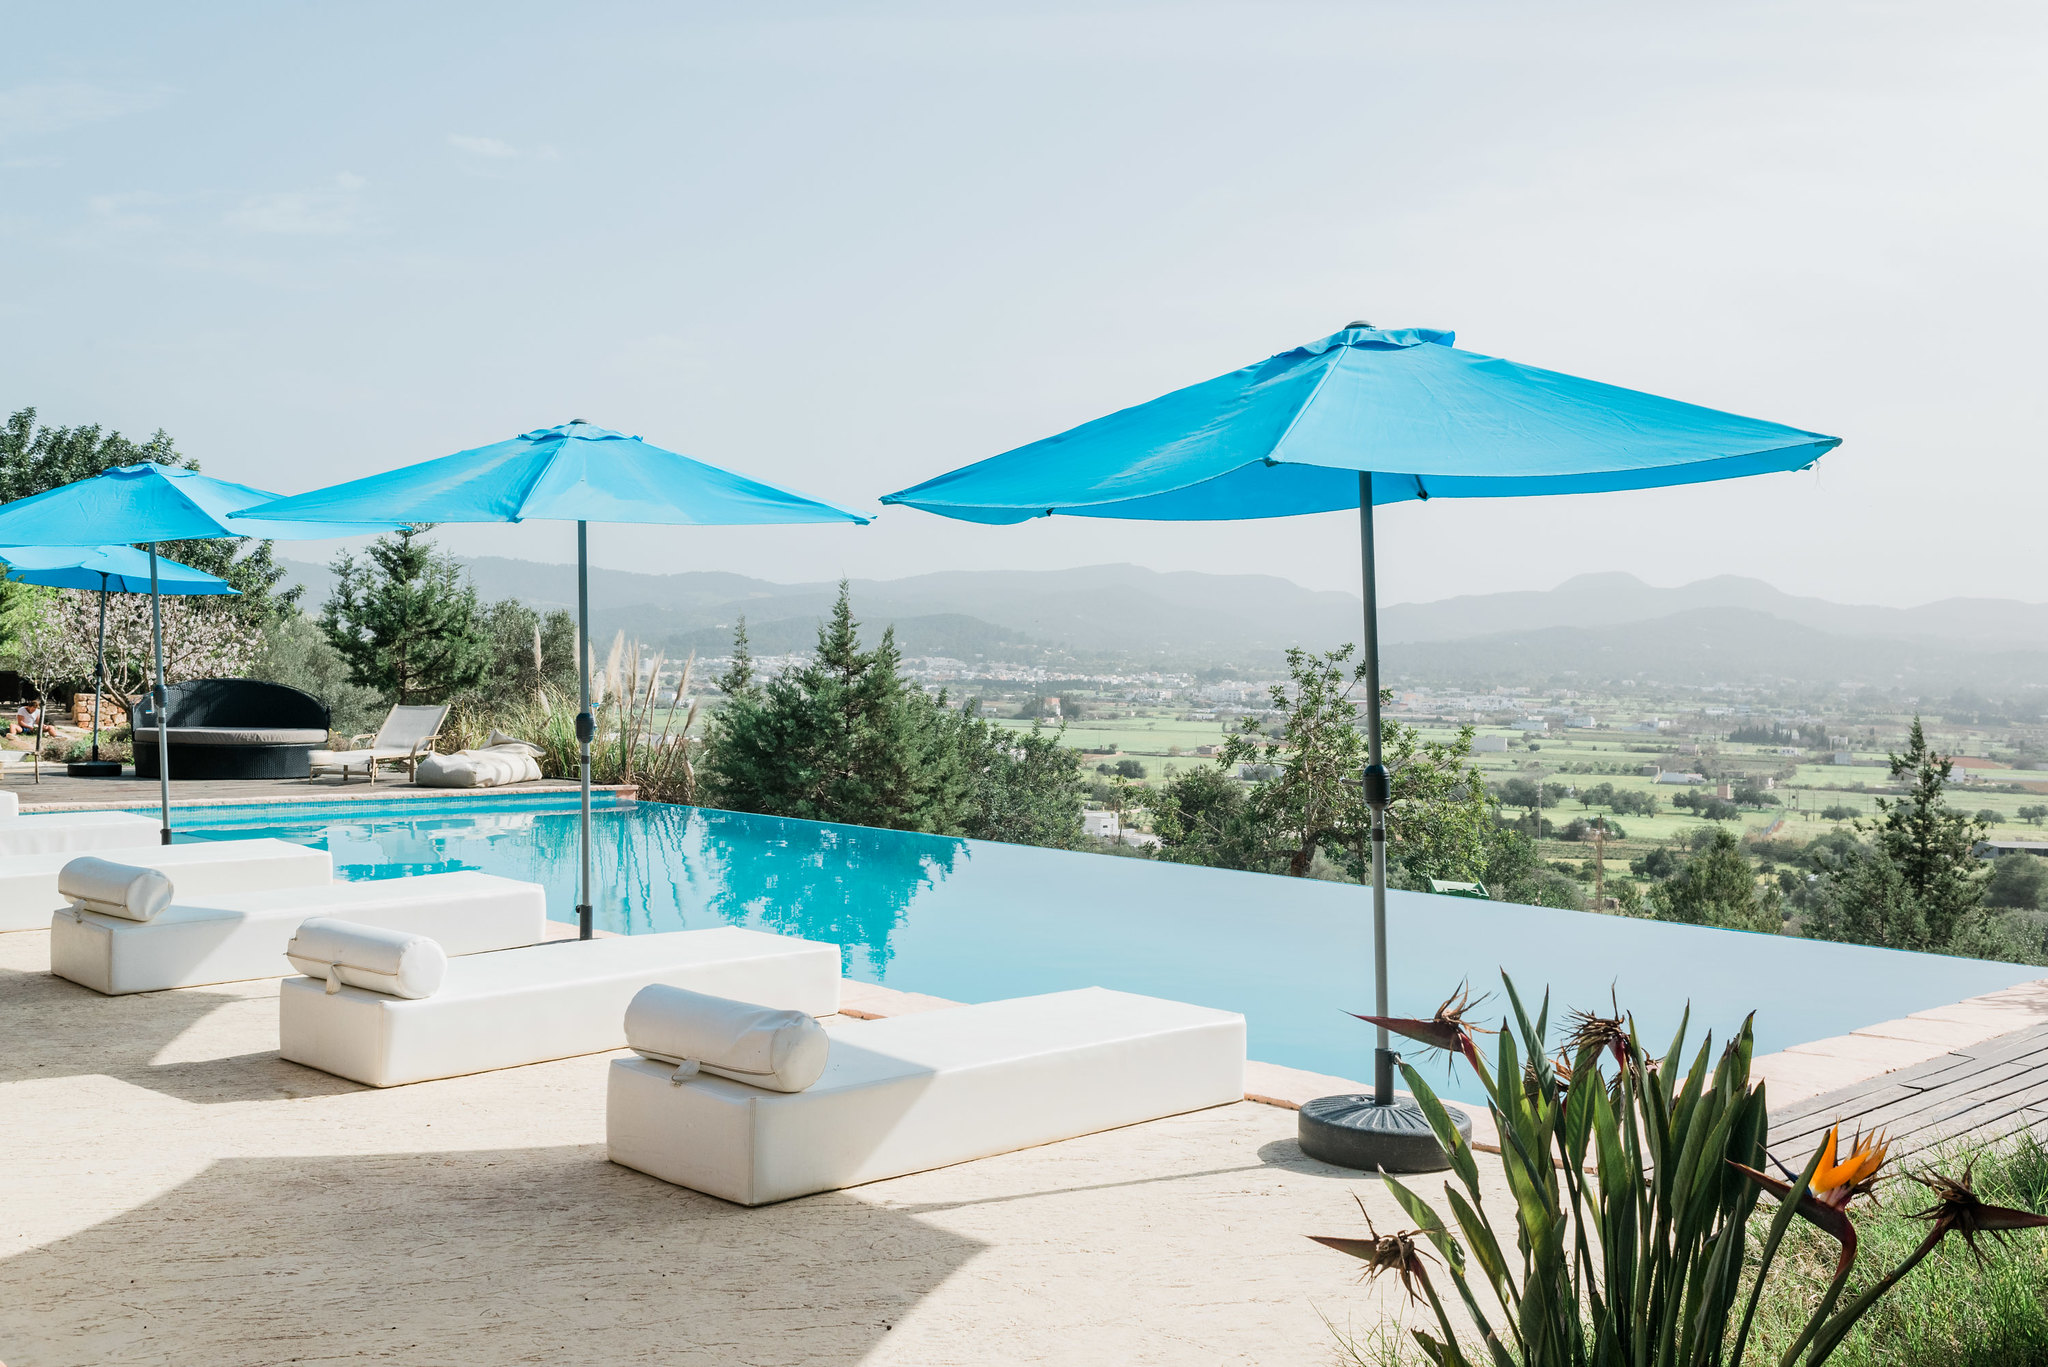 https://www.white-ibiza.com/wp-content/uploads/2020/06/white-ibiza-villas-los-corrales-exterior-pool-view.jpg